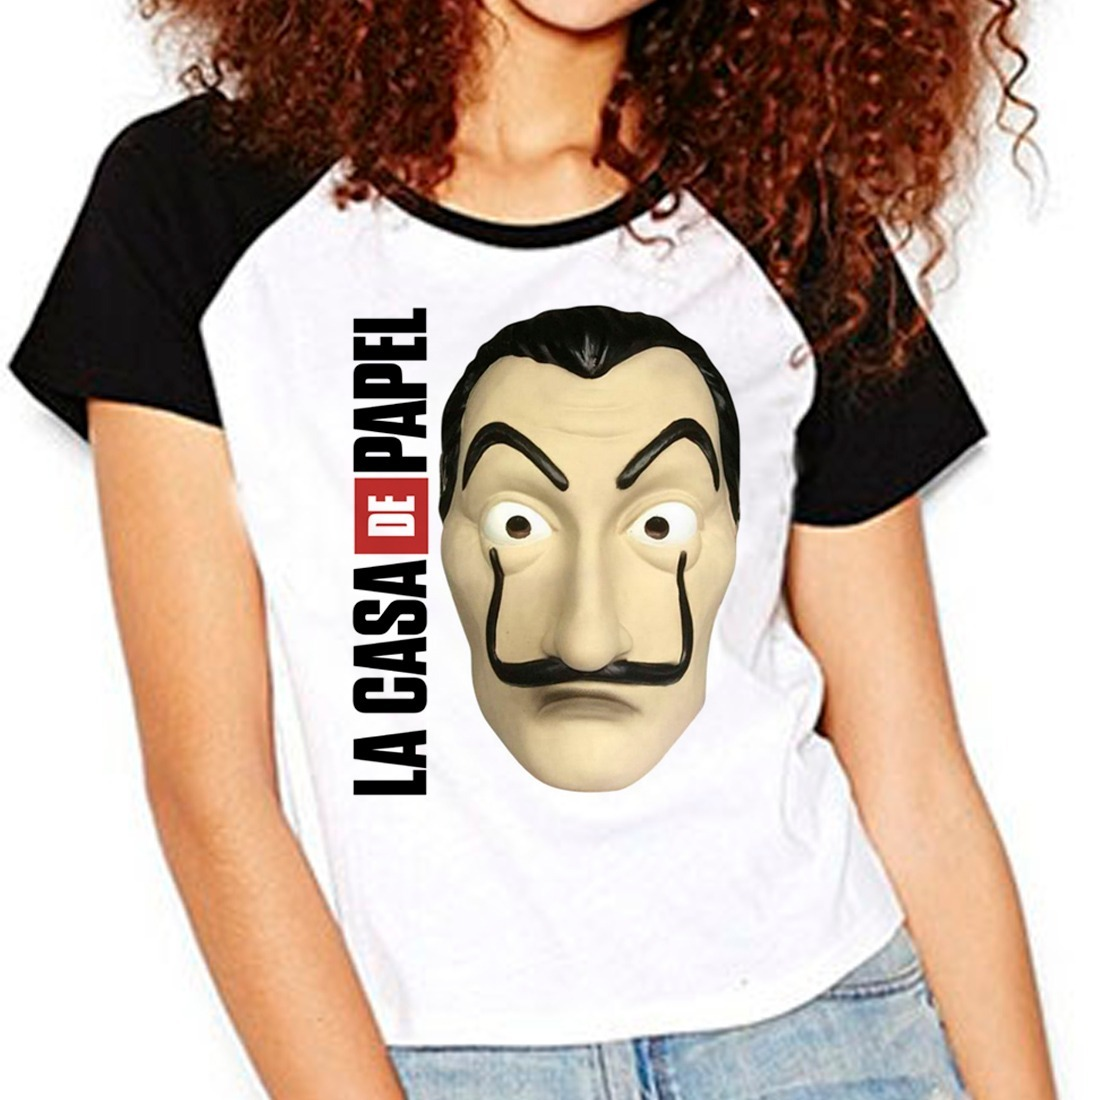 camiseta la casa de papel mascara dali série raglan babylook. Carregando  zoom. 0a17f7a980904